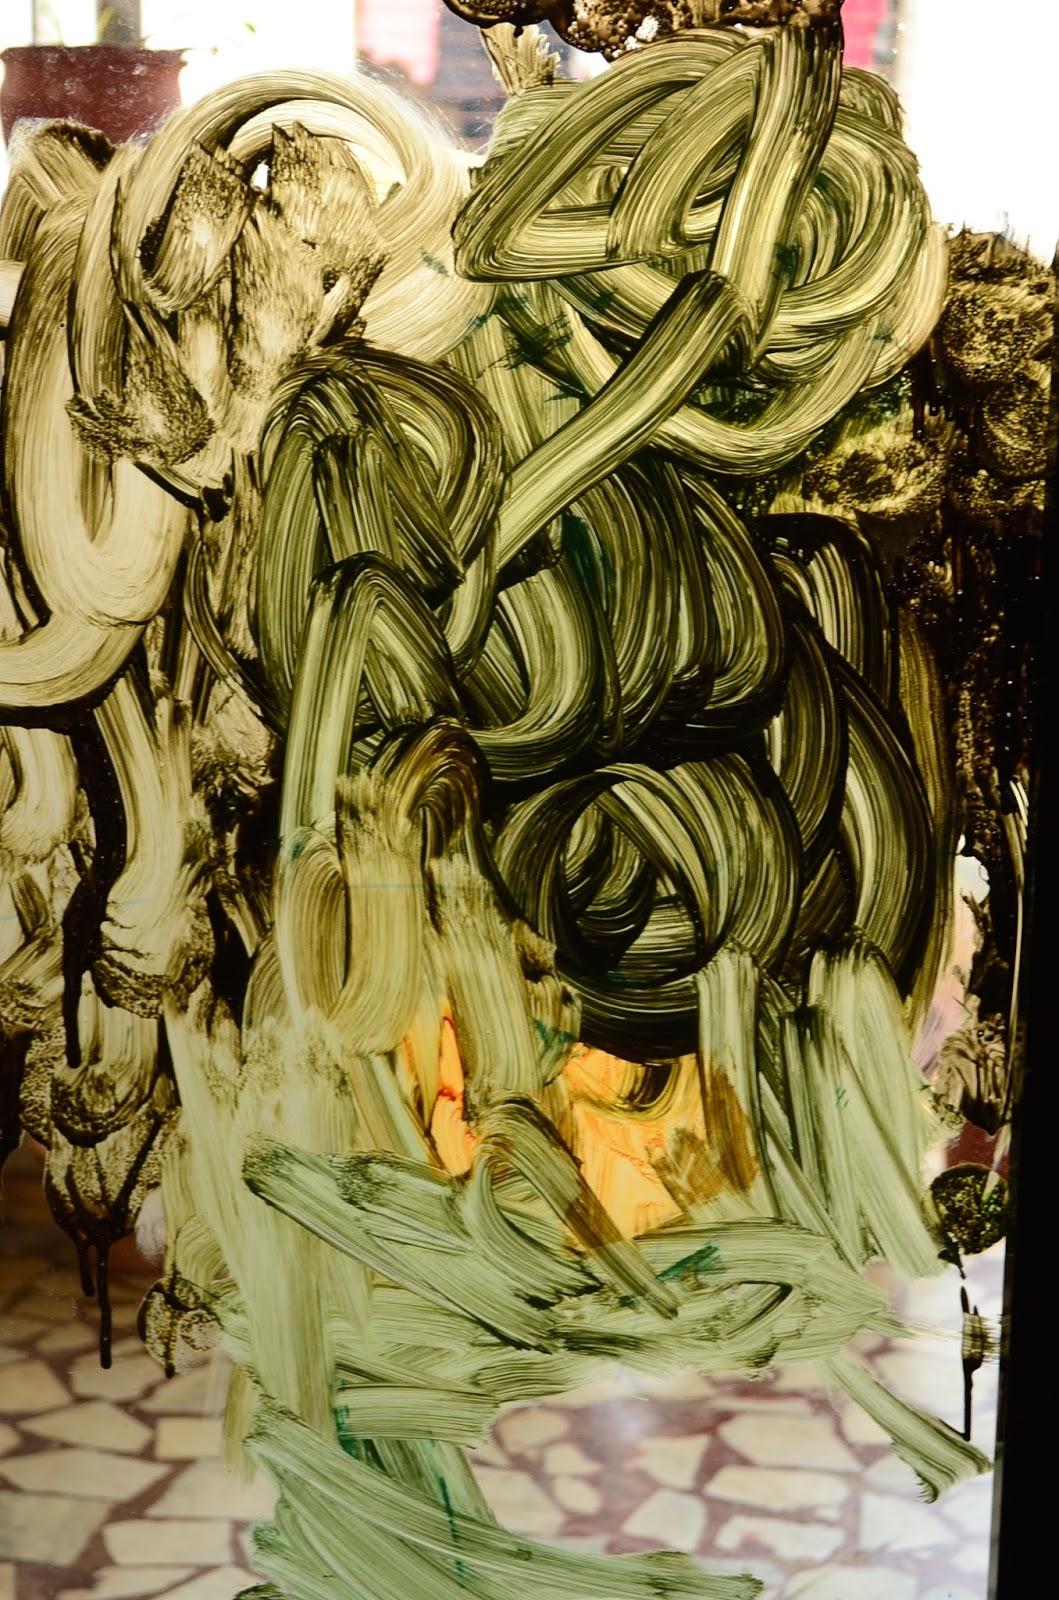 Mural Art on Glass Doors (Art Studio Diaries)